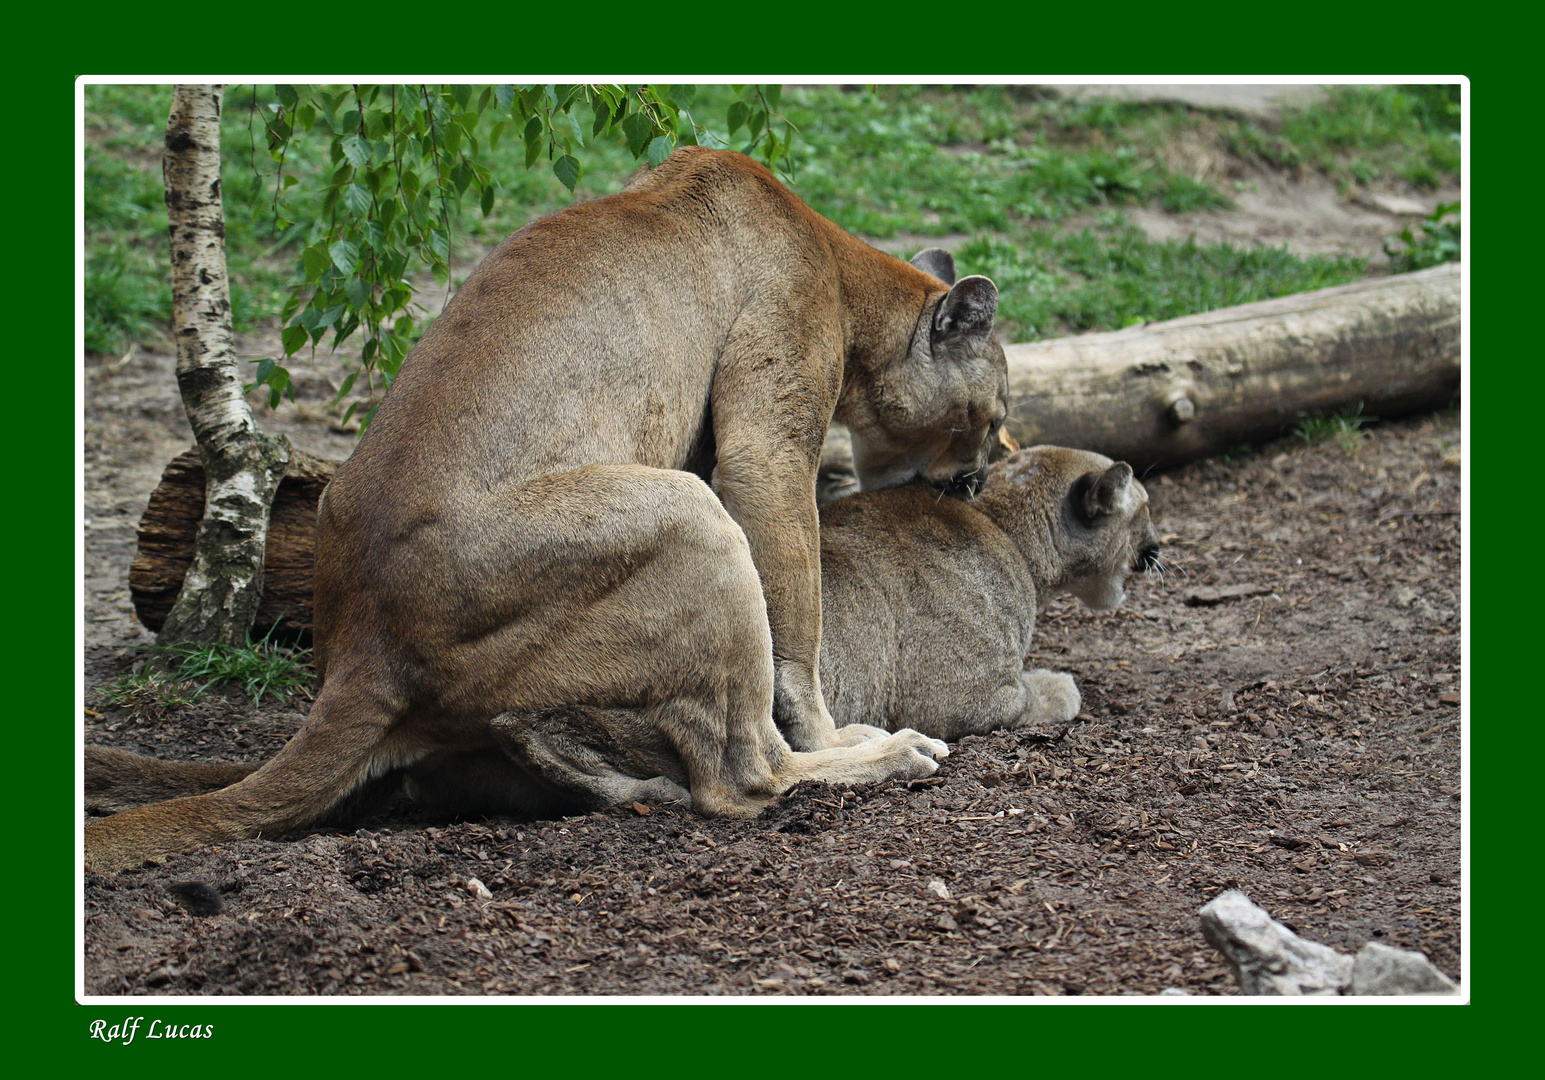 Pumapaarung